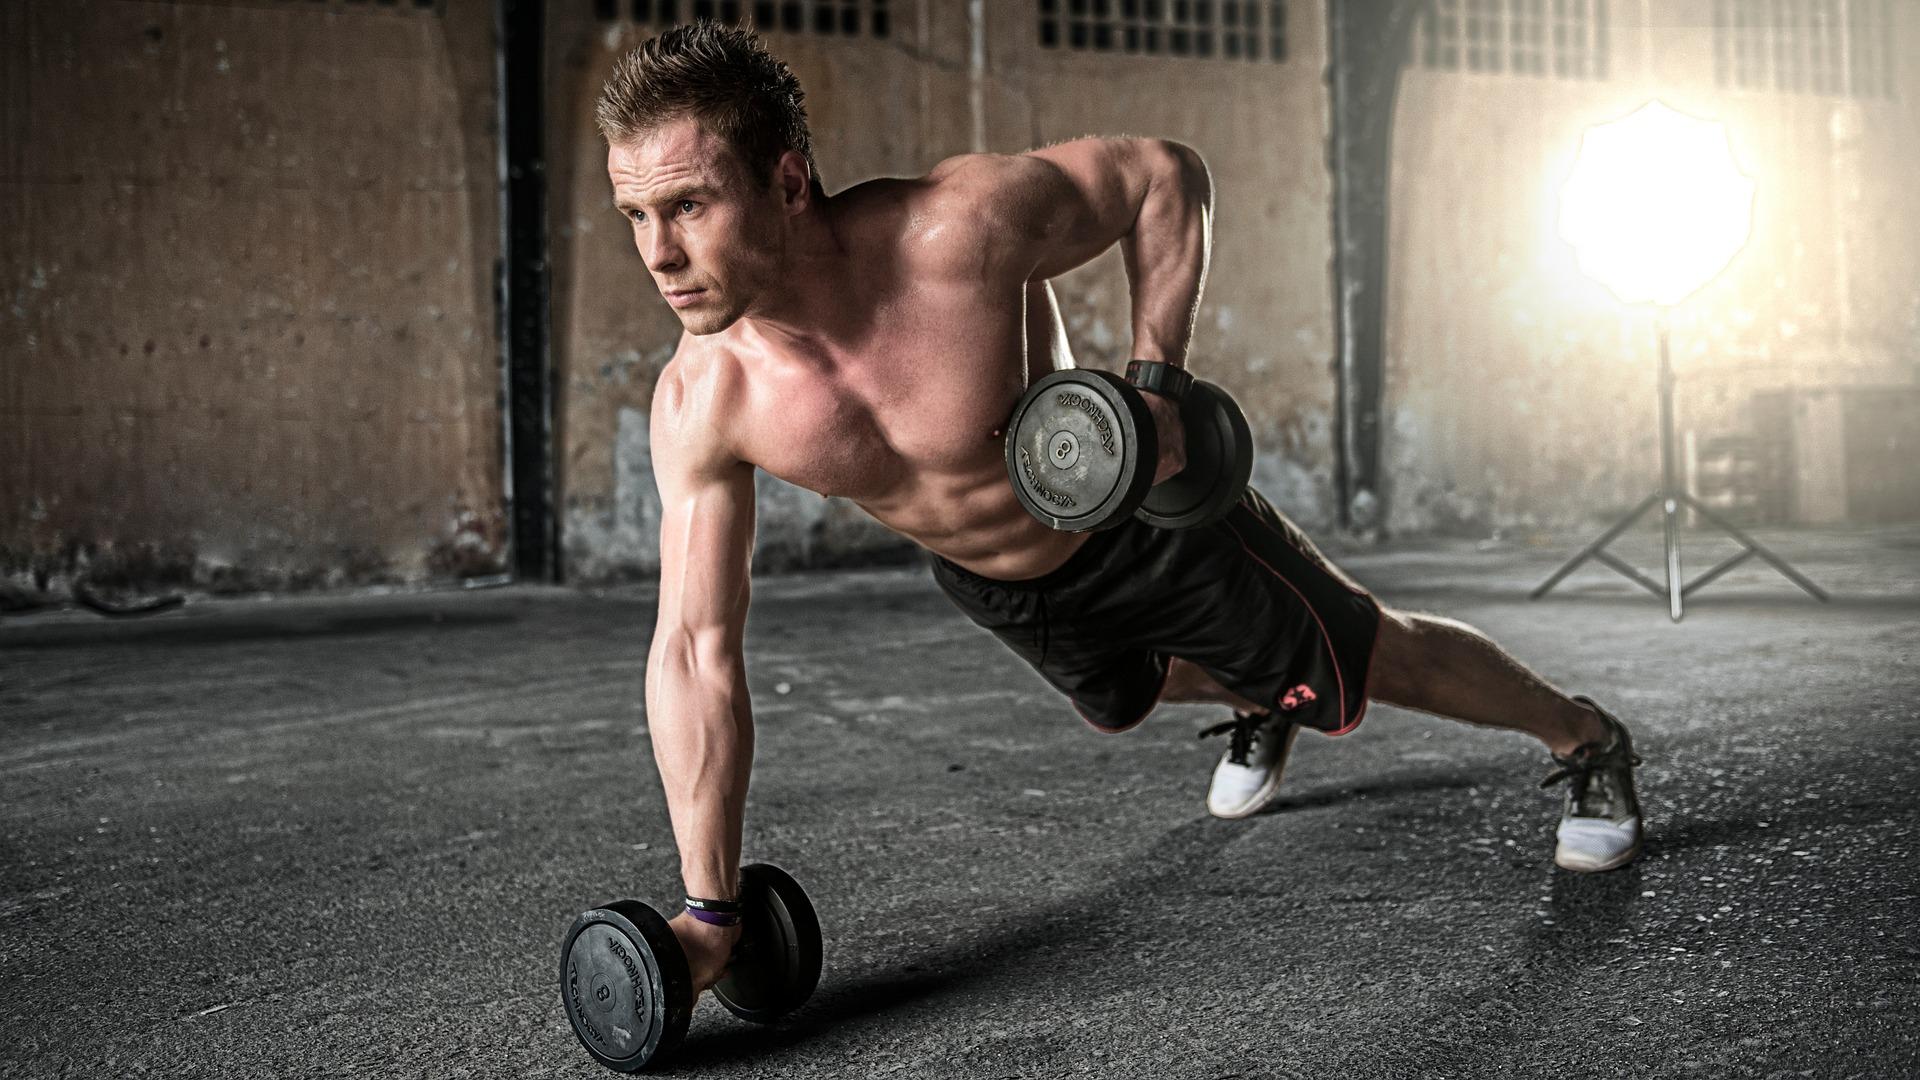 Mand dyrker motion